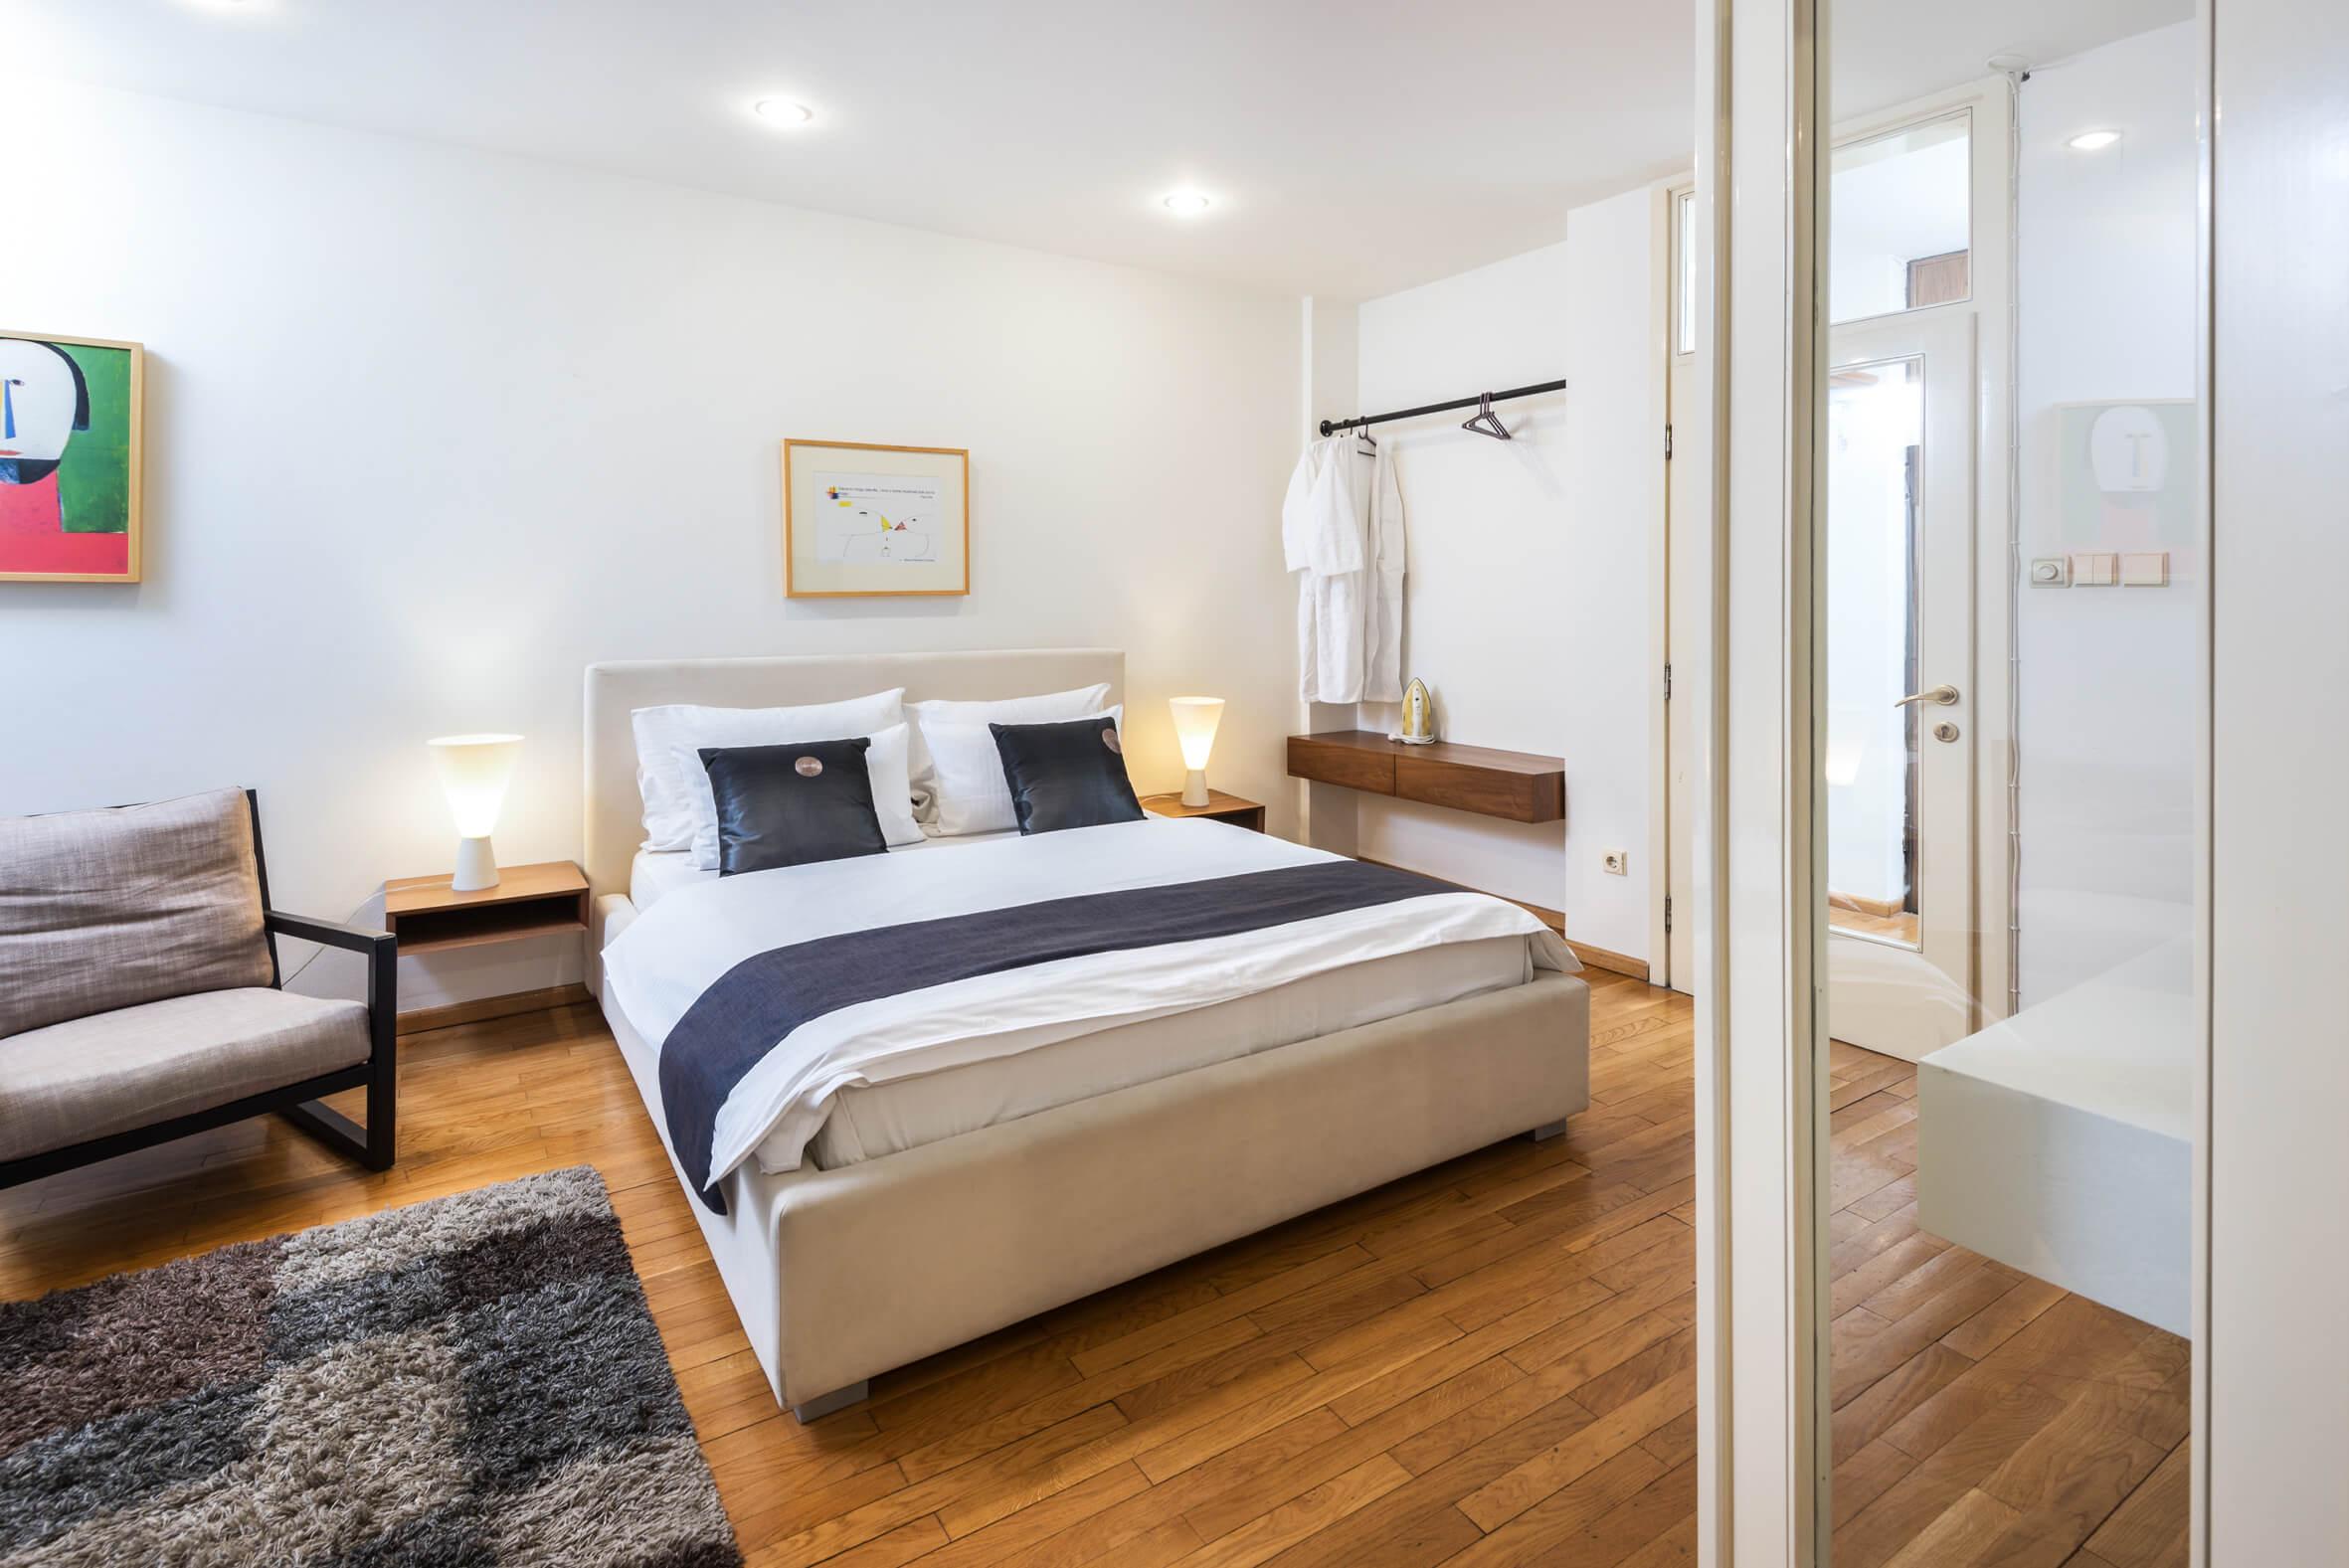 Apartmani Beograd | Stan na dan Beograd centar | Apartman A25 - Spavaća soba